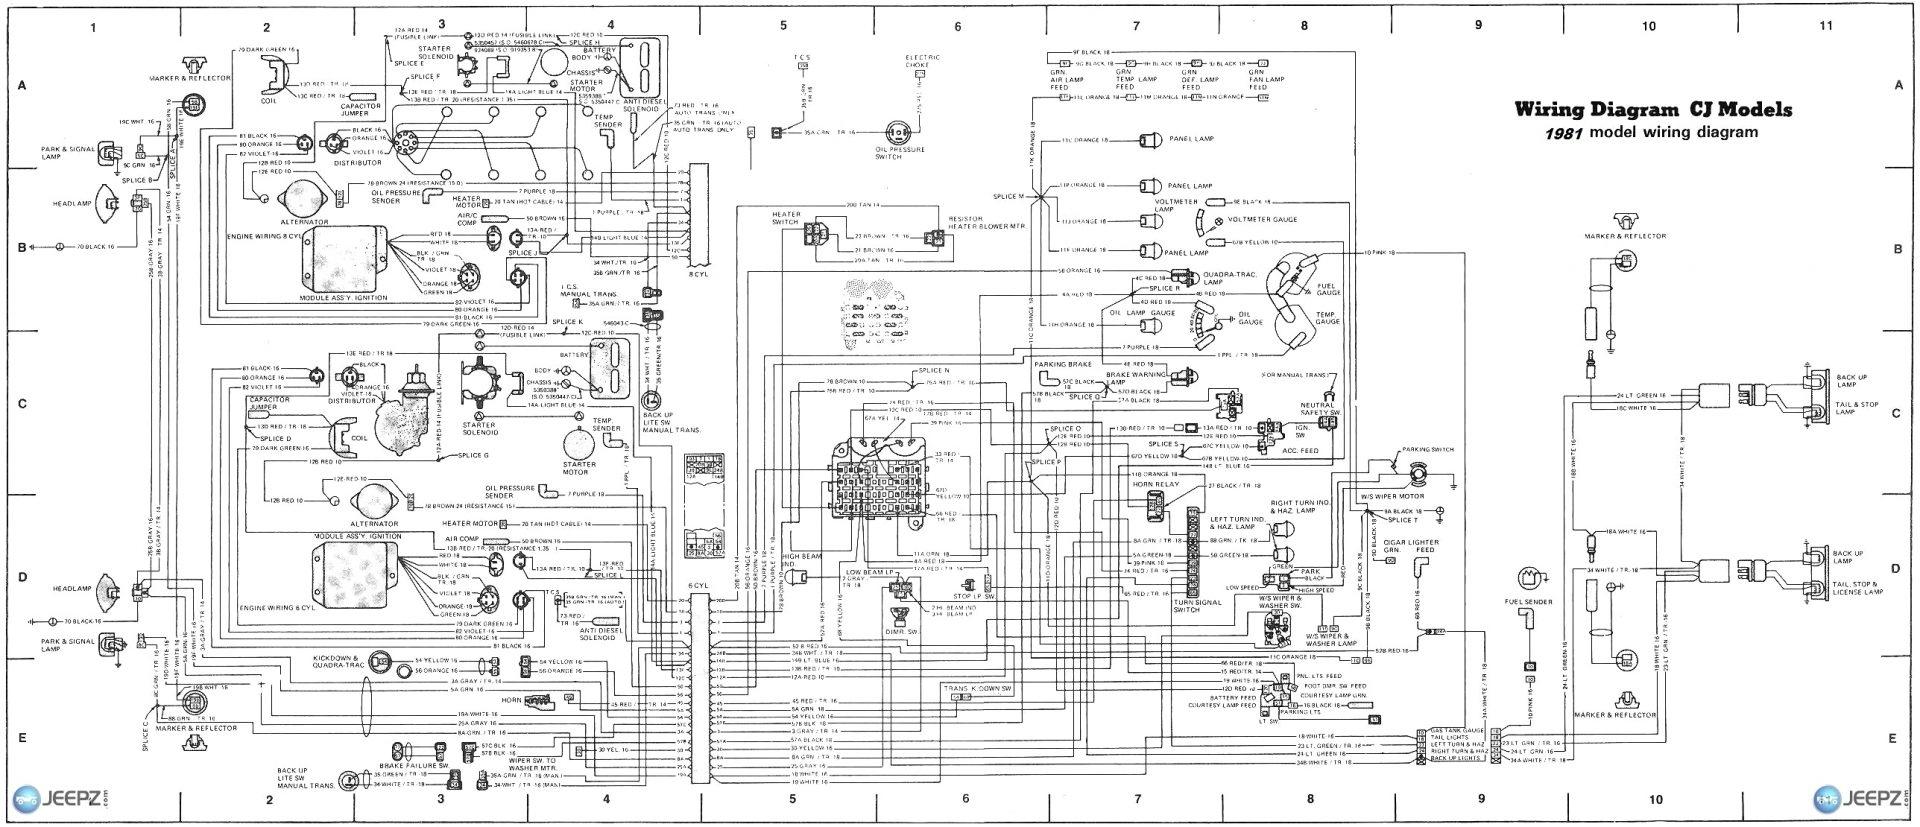 clark forklift wiring diagram Download-clark forklift wiring diagram Collection Clark Forklift Wiring Diagrams Library Wiring Diagram • 8 6-n